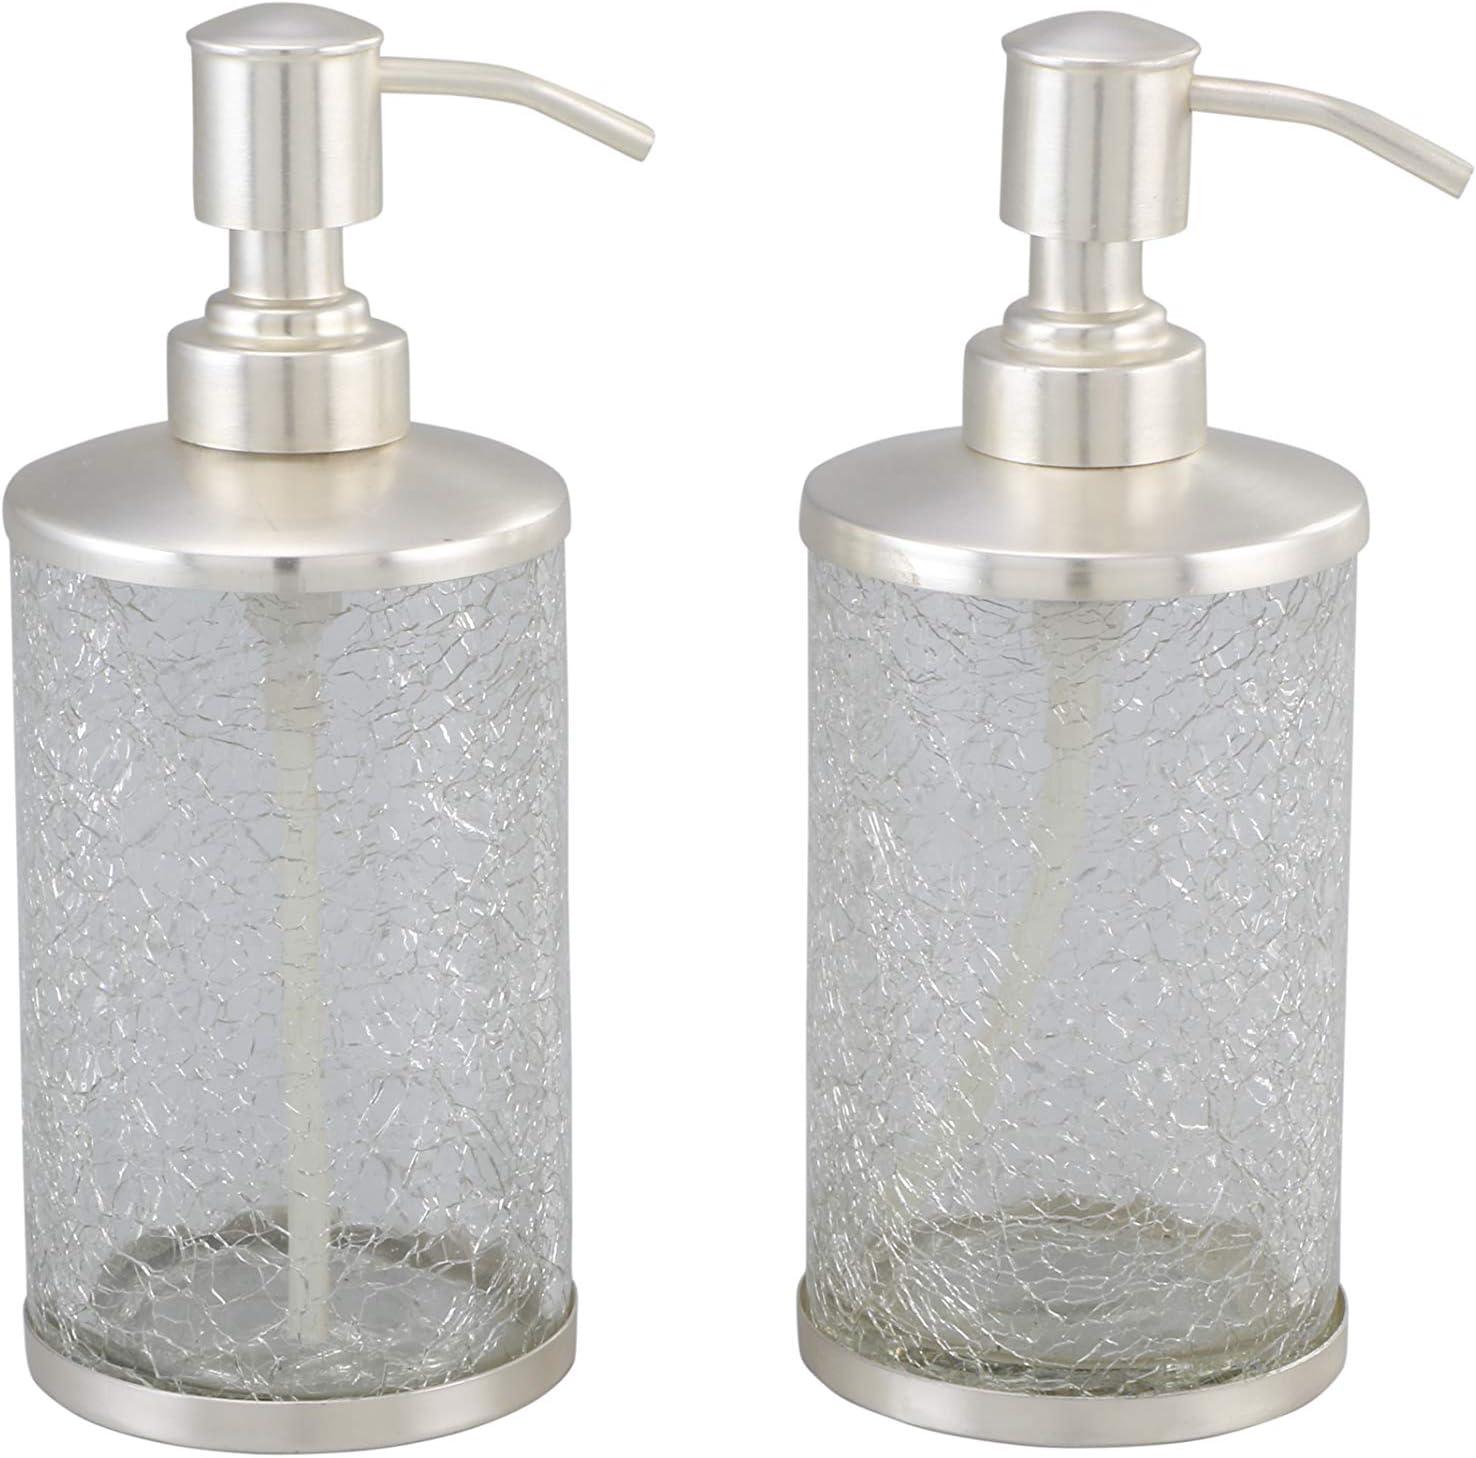 ARTISANS VILLAGE Straight Crackle Lotion Bottle - Liquid Hand Soap Dispenser, Refillable Lotion Pump for Bathroom, Kitchen Countertop - Set of 2: Home & Kitchen